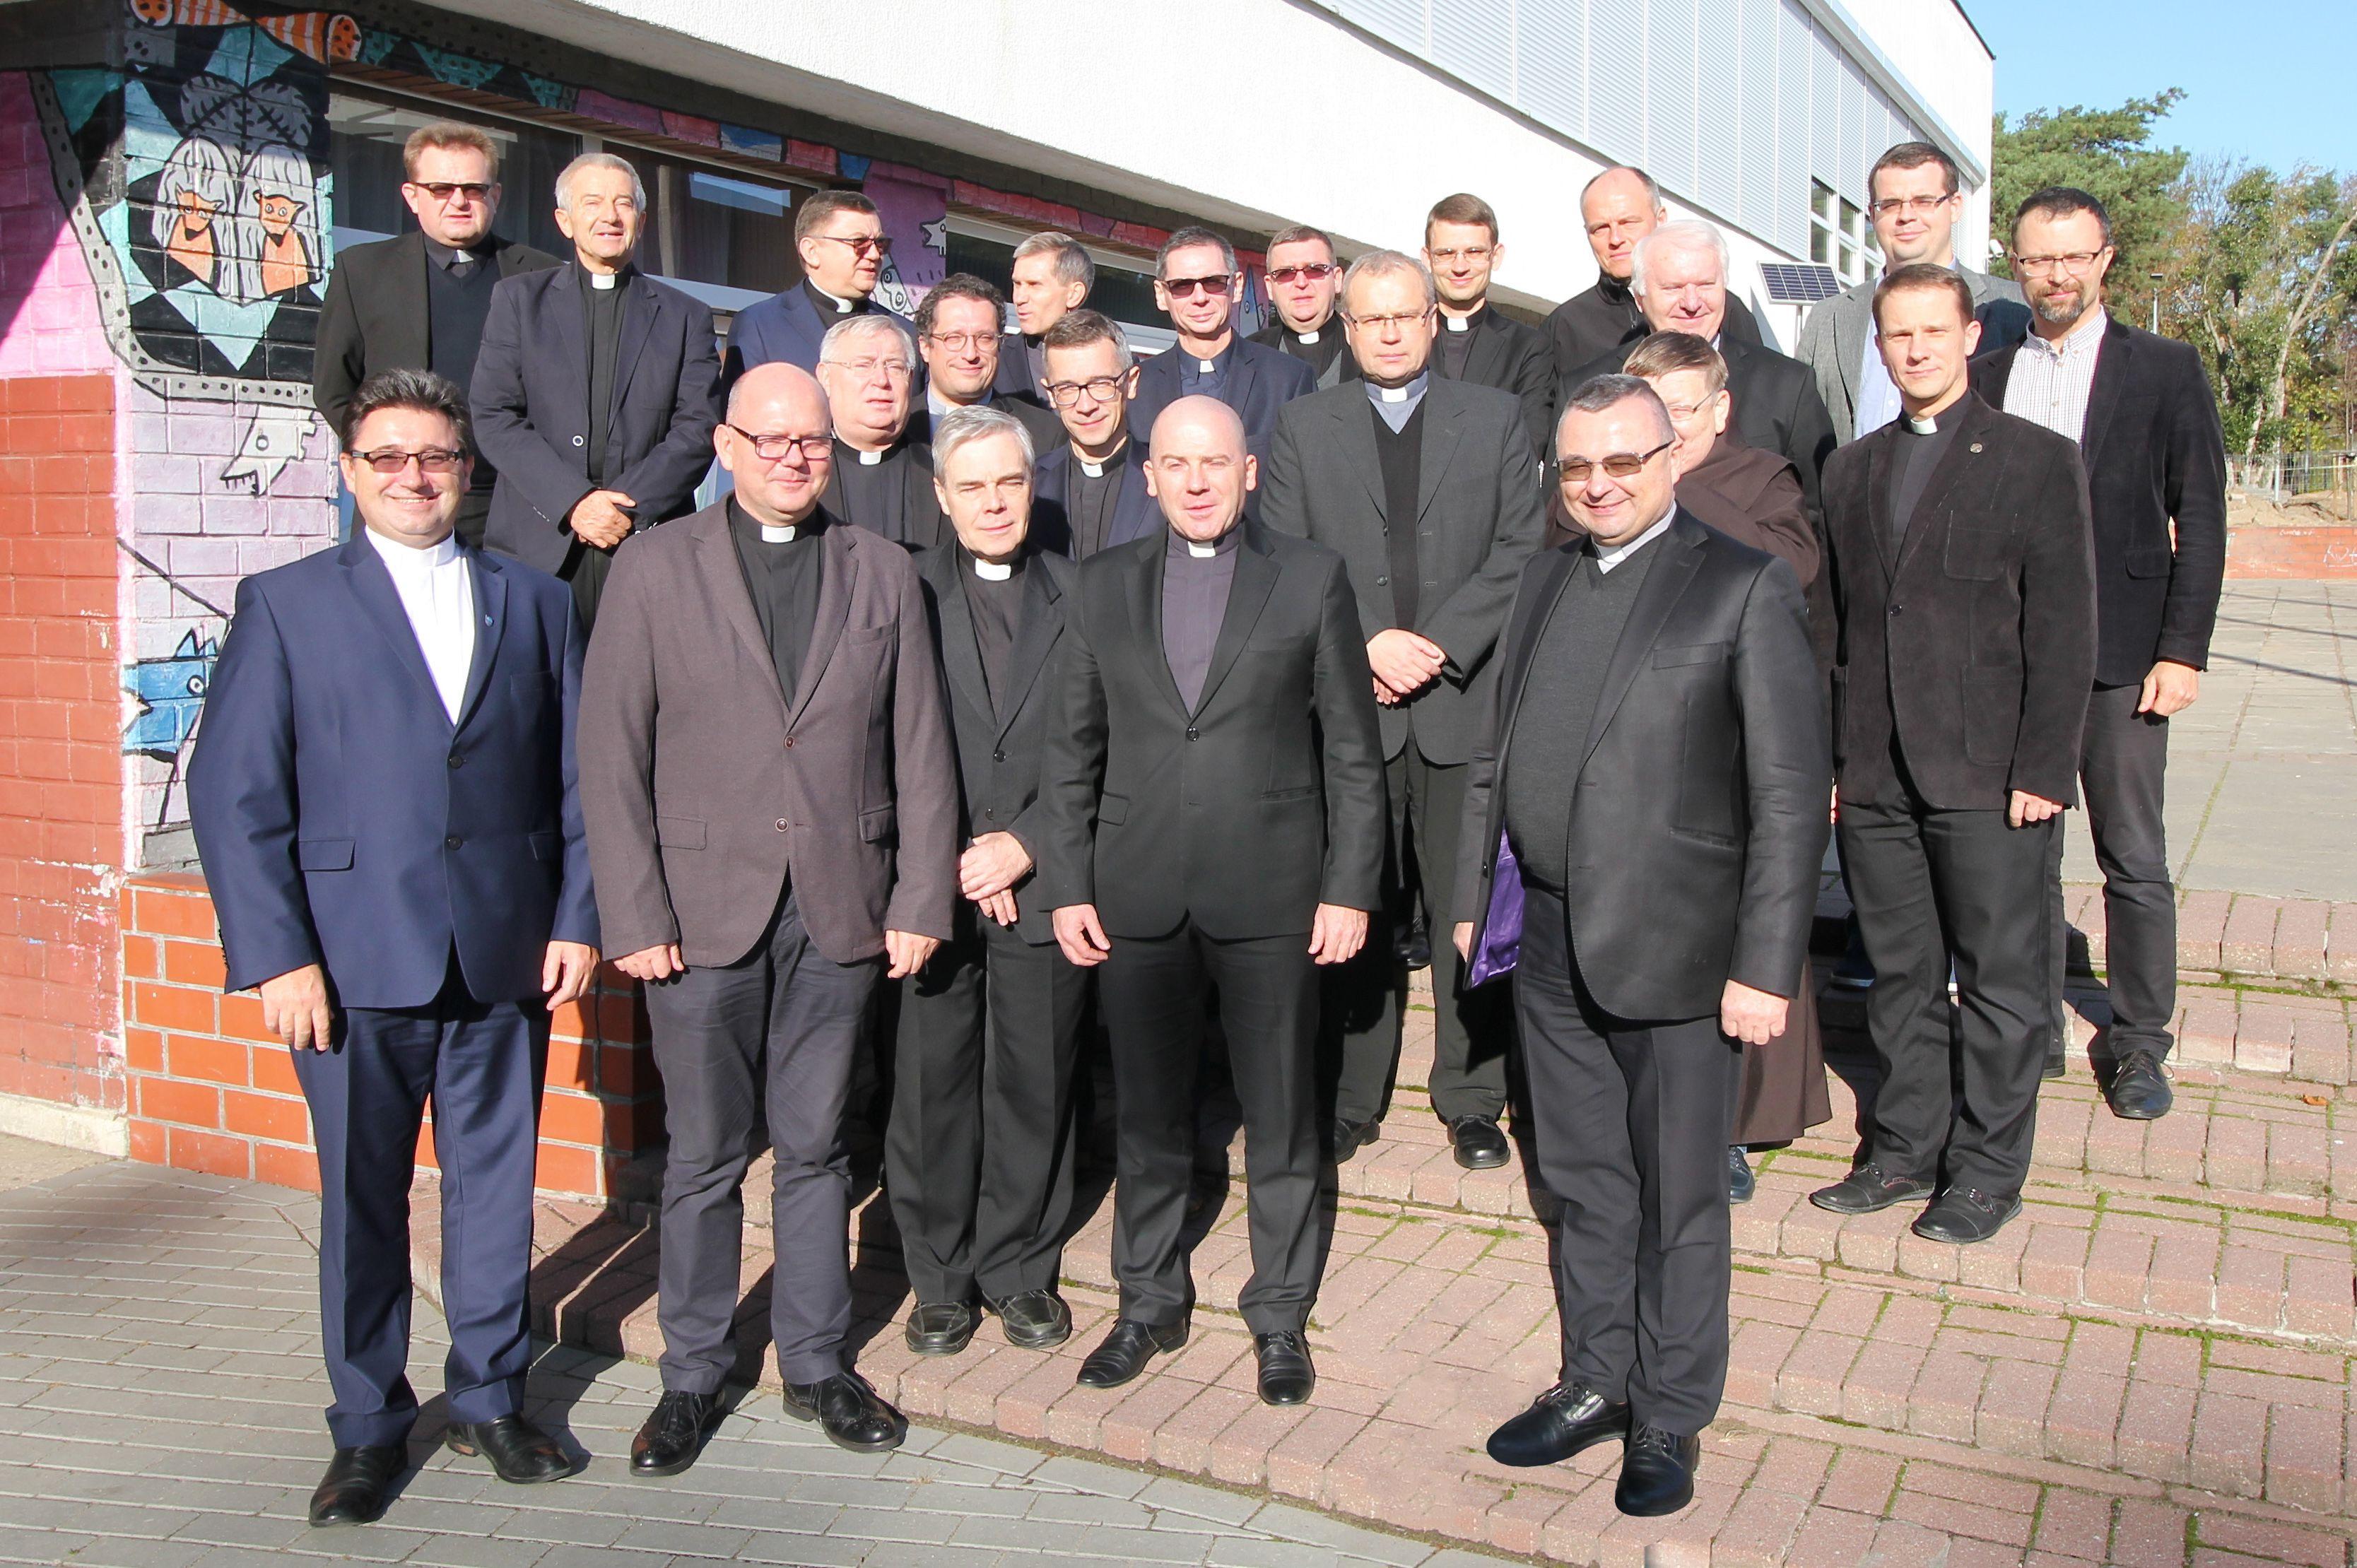 https://www.teologia.umk.pl/panel/wp-content/uploads/Rada-Dyscypliny-WT-04-extra.jpg